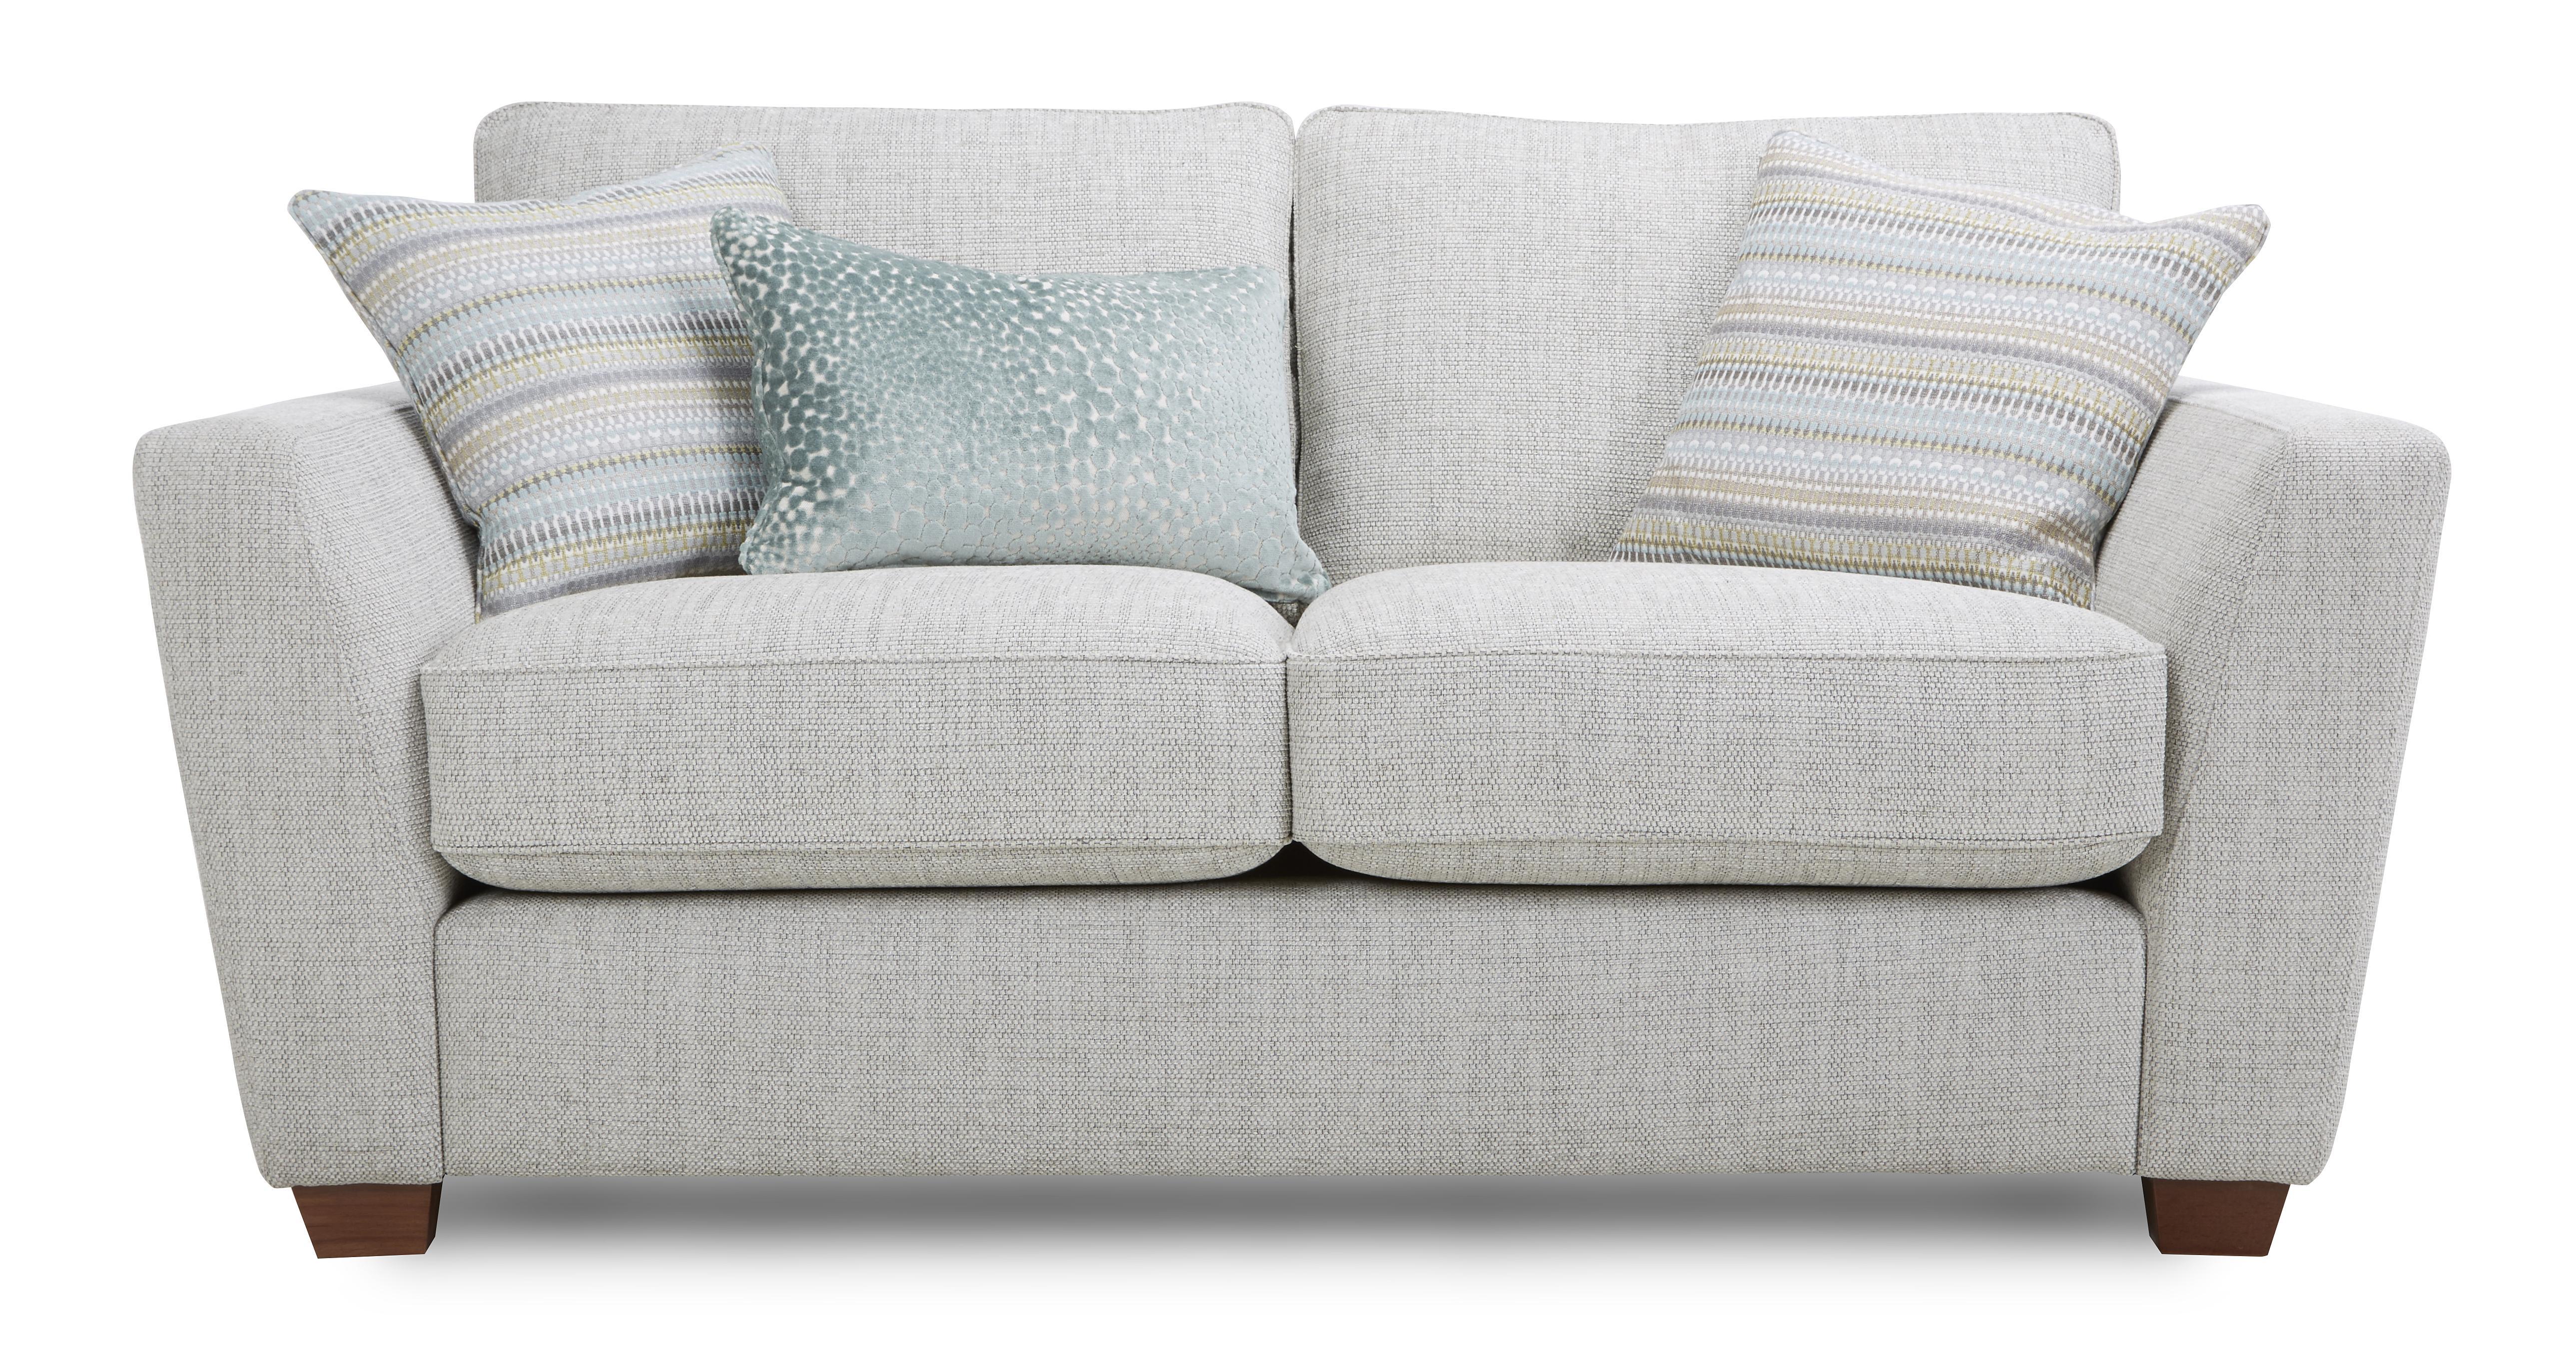 sophia 2 seater sofa dfs. Black Bedroom Furniture Sets. Home Design Ideas